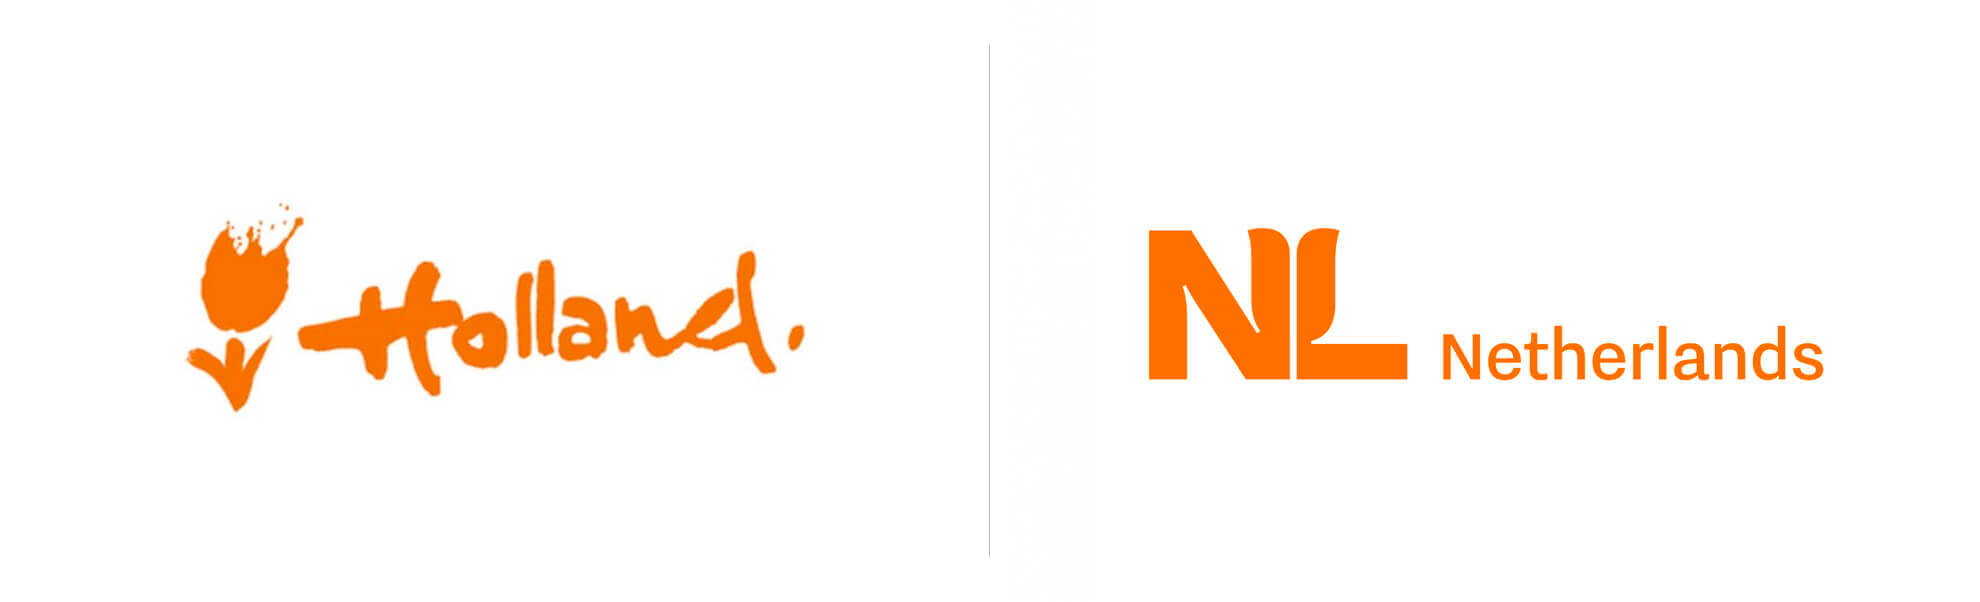 Holandia toteraz Niderlandy